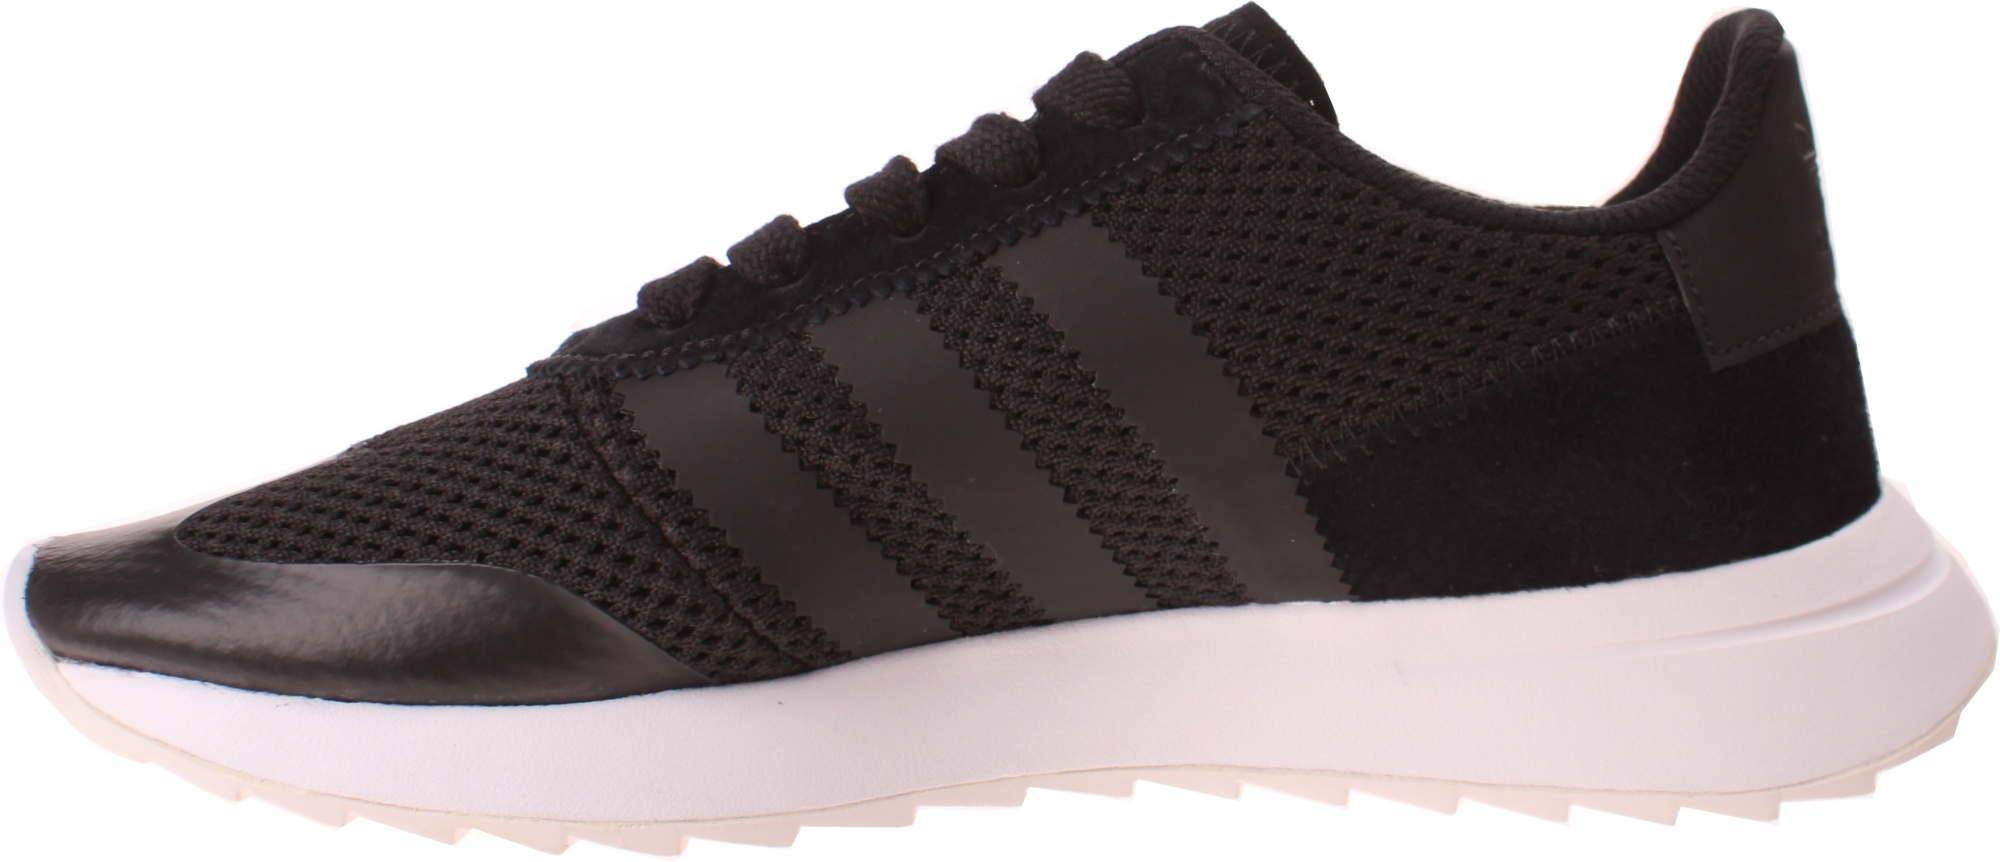 24d0f5b343f adidas sneakers Flashback dames zwart adidas sneakers Flashback dames zwart  ...